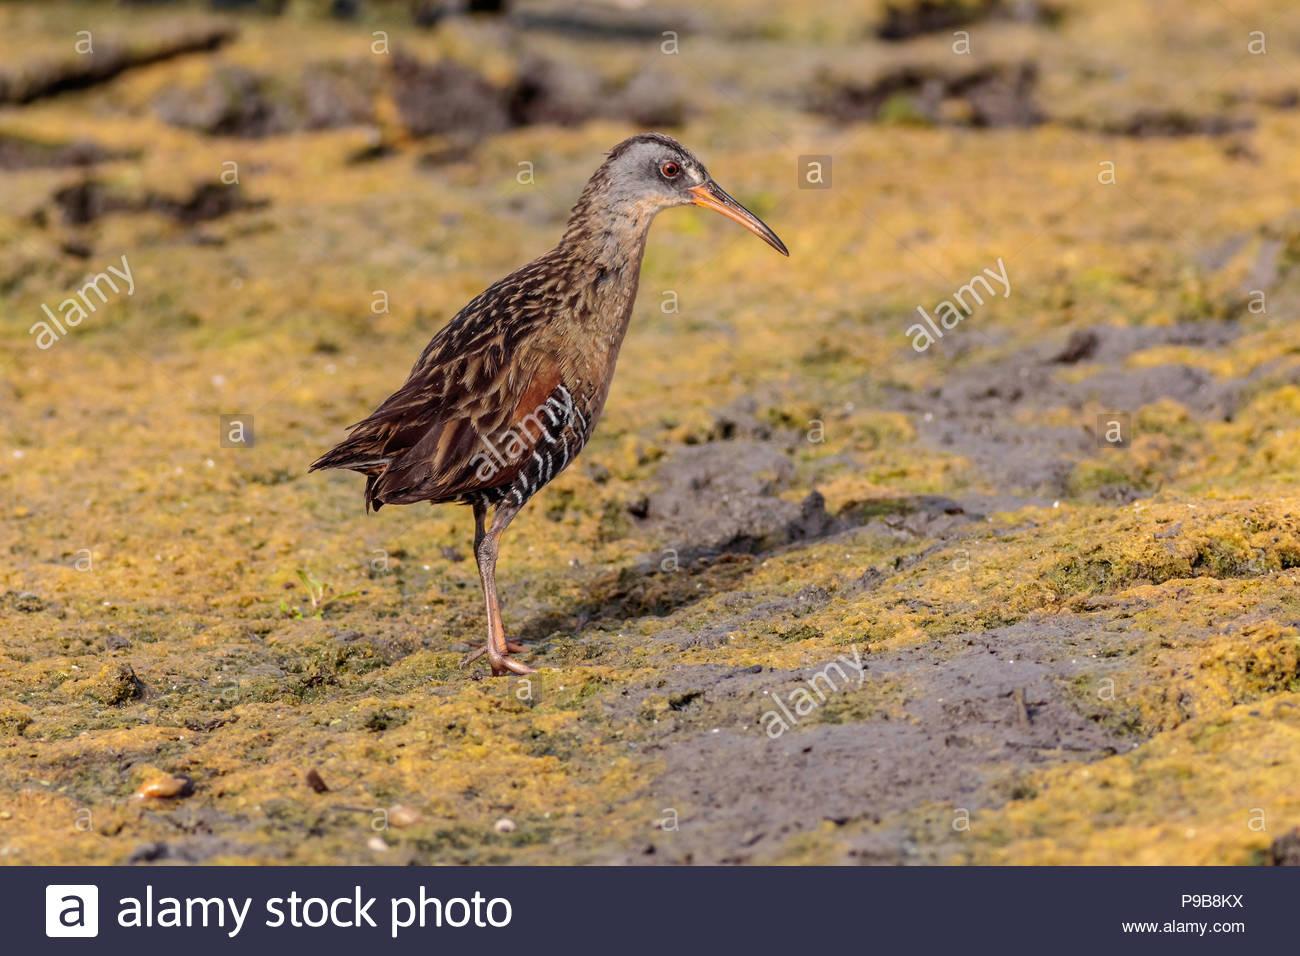 Rallus limicola Virginia rail at freshwater marsh - Stock Image